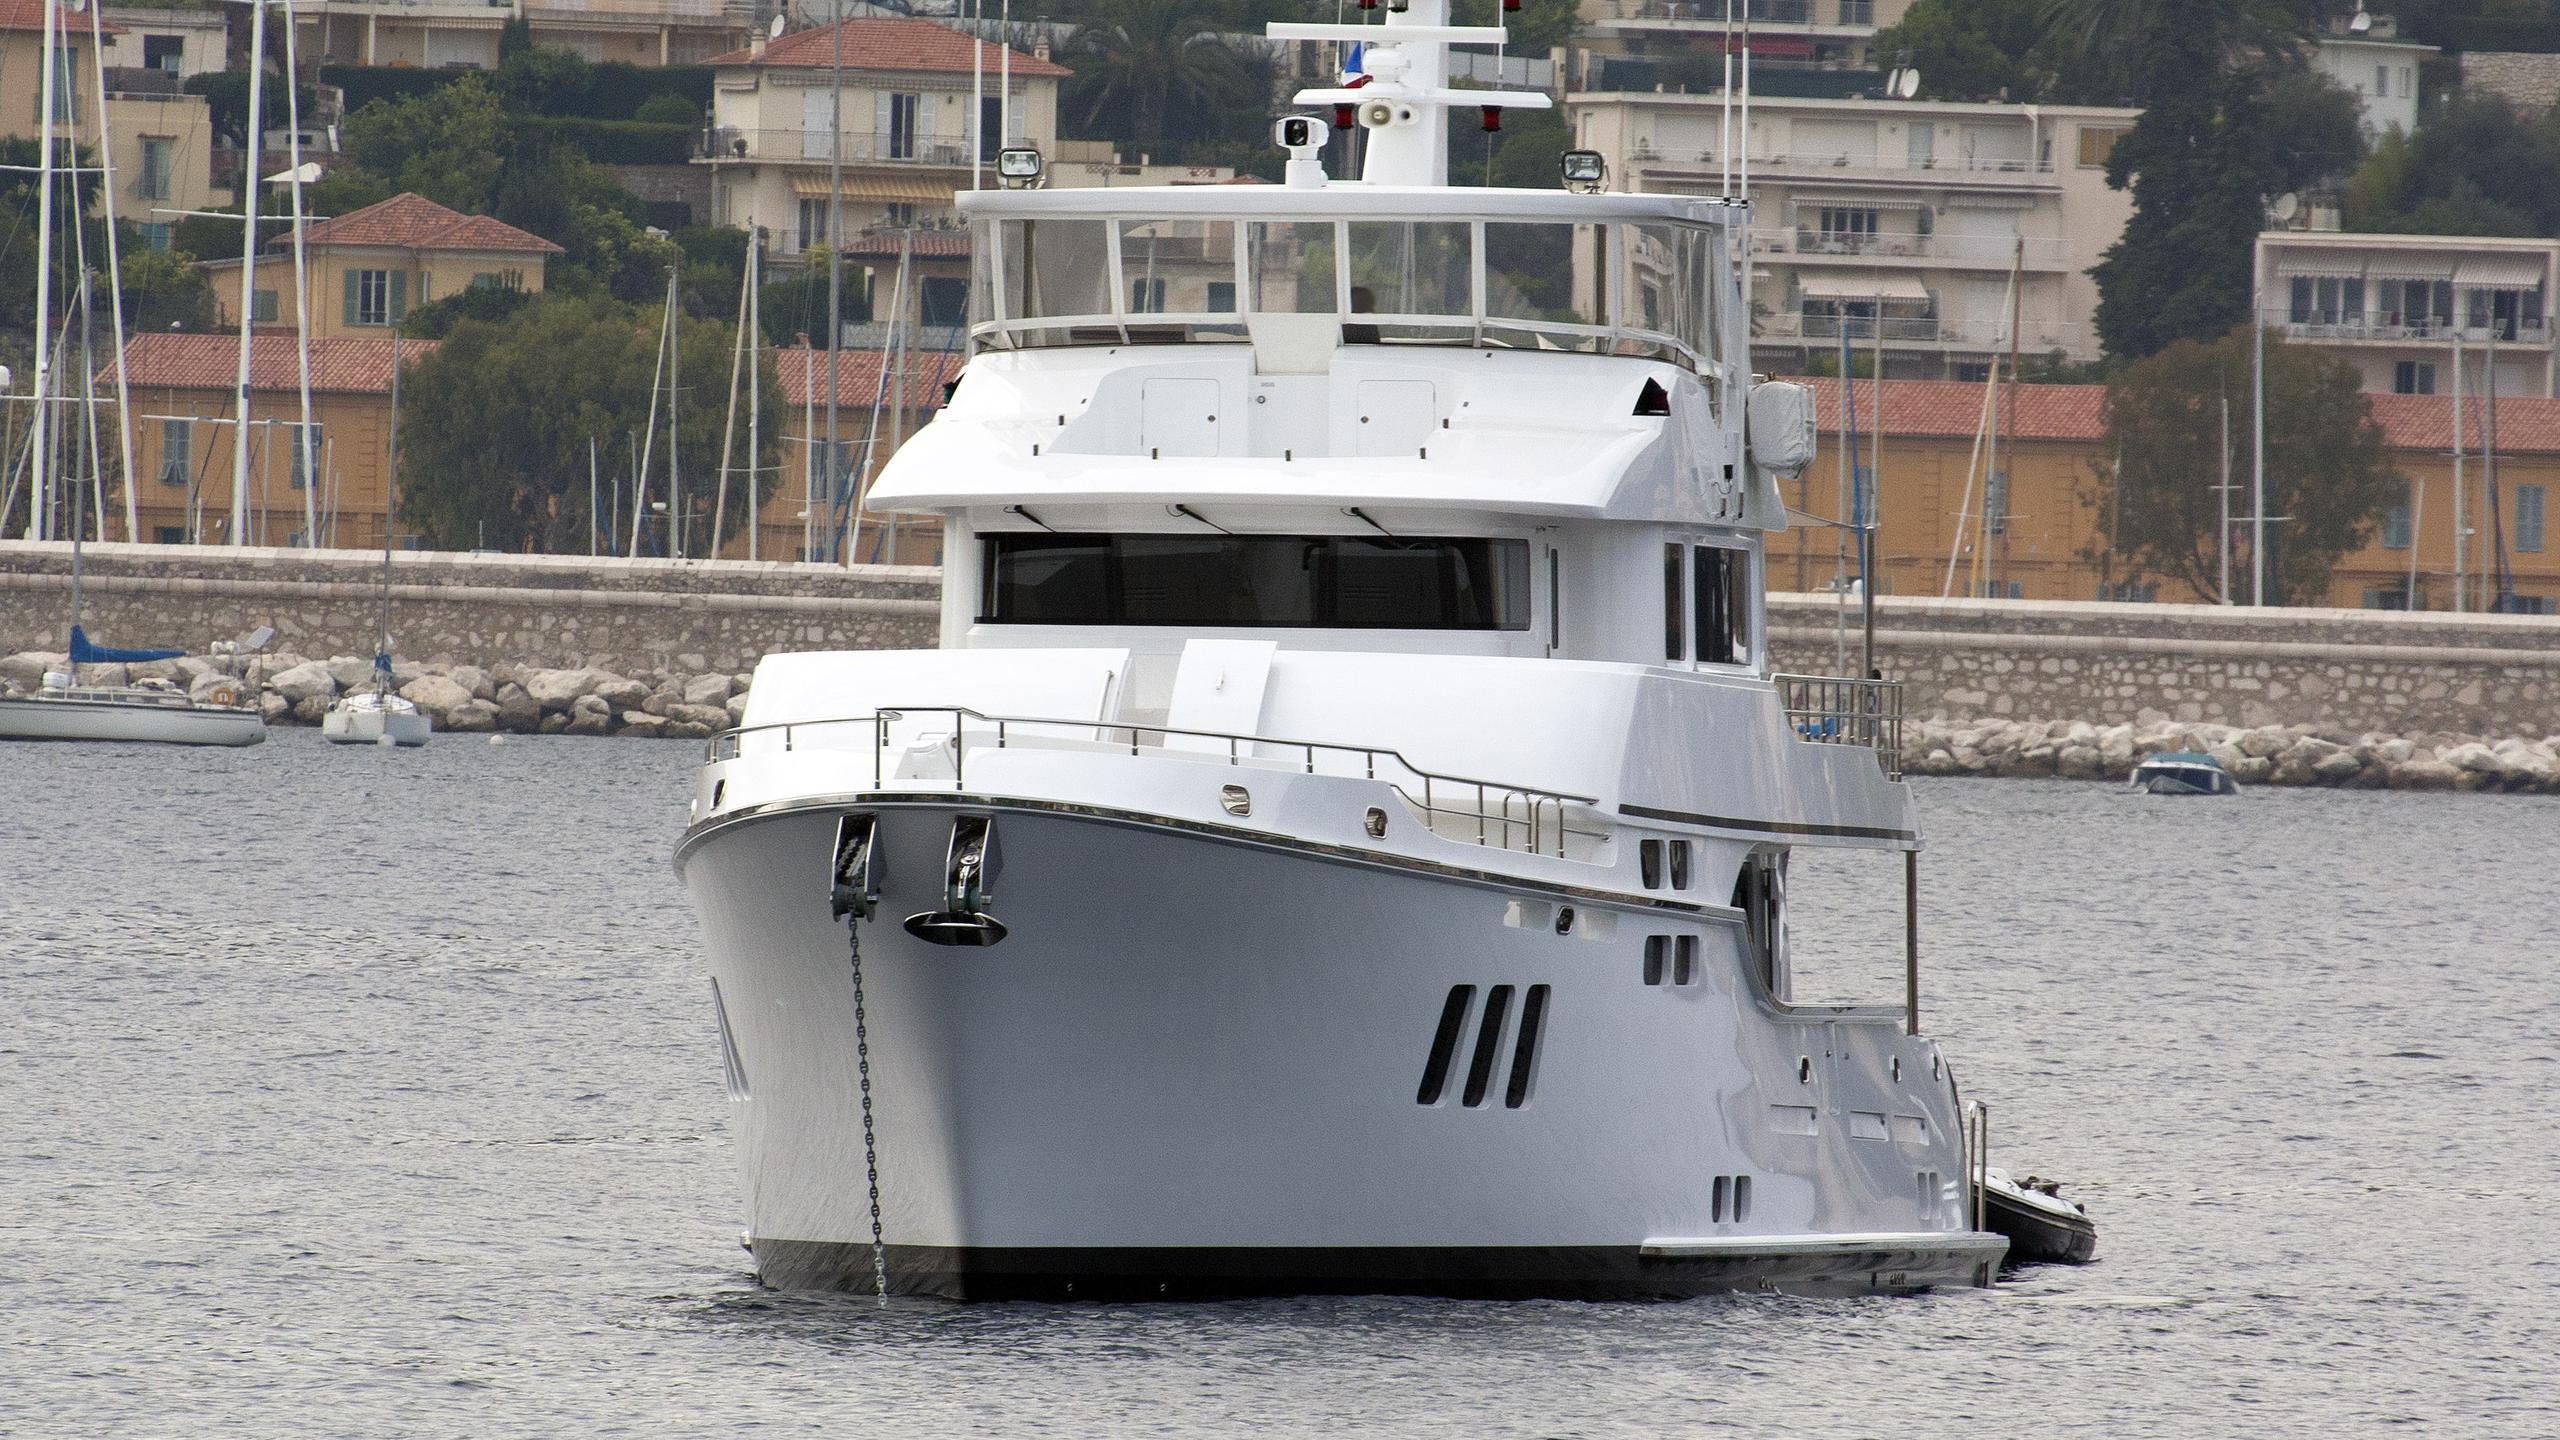 zembra-explorer-yacht-nordhavn-86-2012-27m-bow